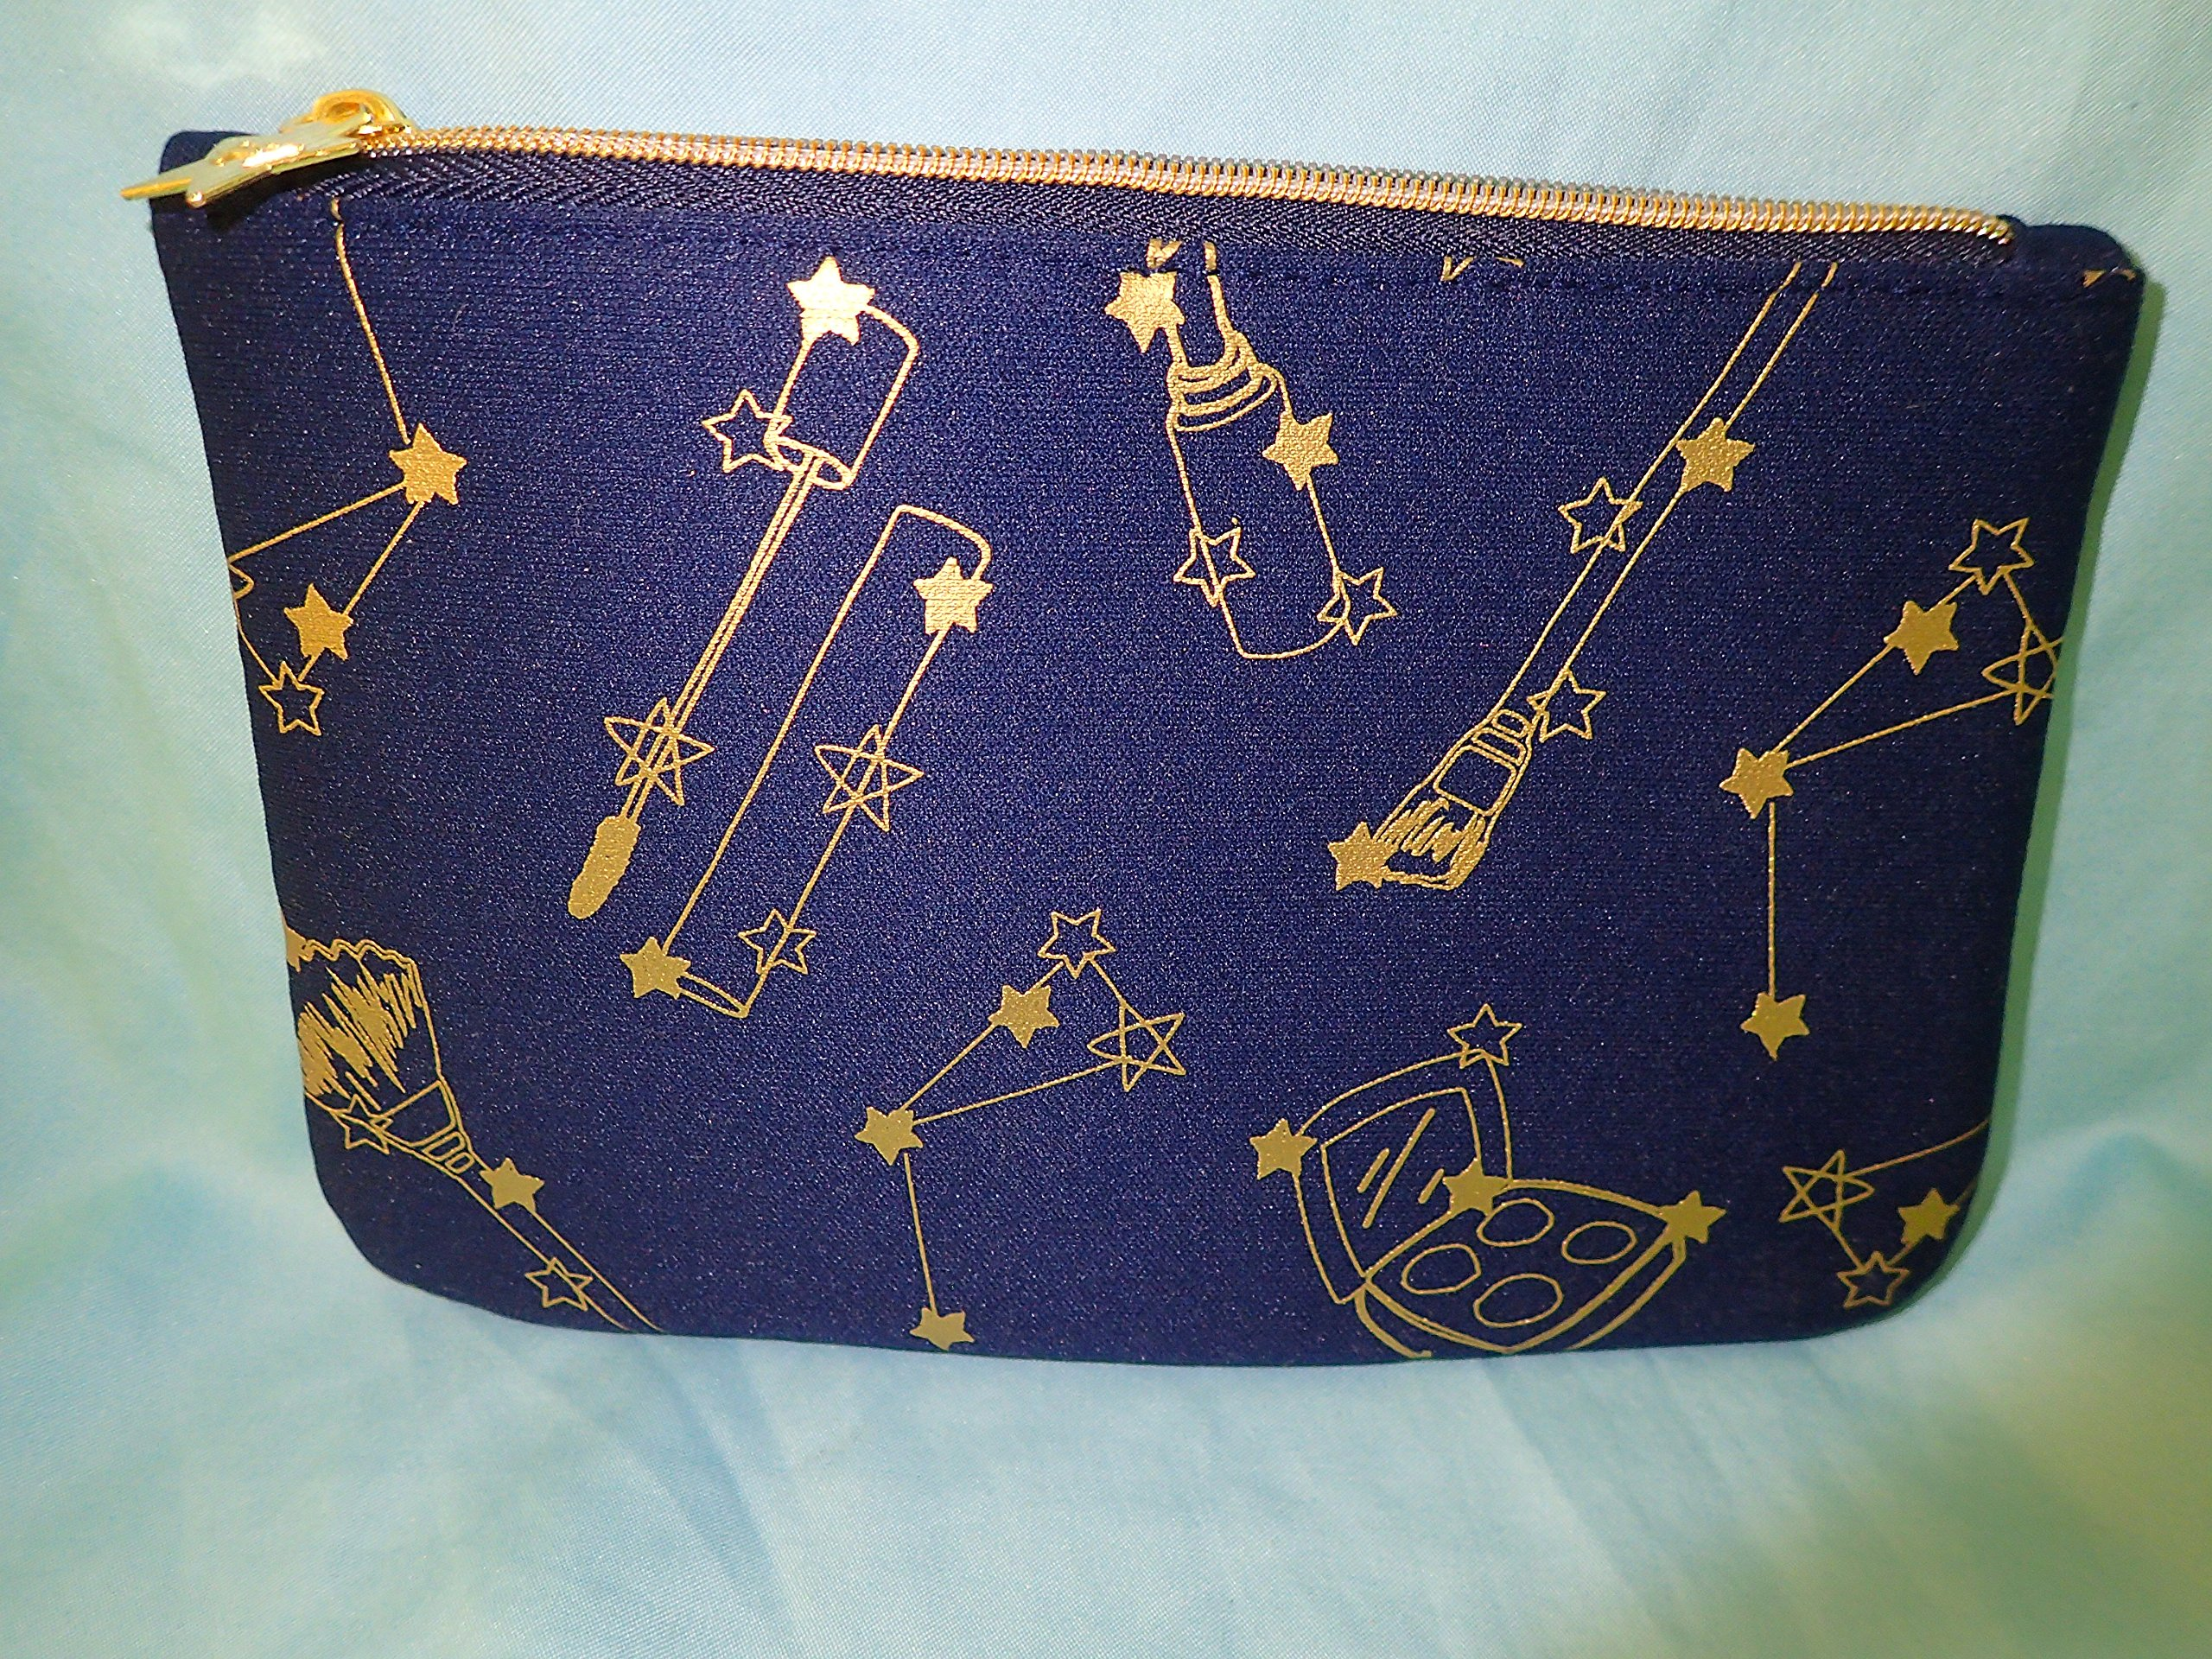 495191ee8f Ipsy November 2016 Navy Blue Makeup Design Zippered Cosmetics Bag